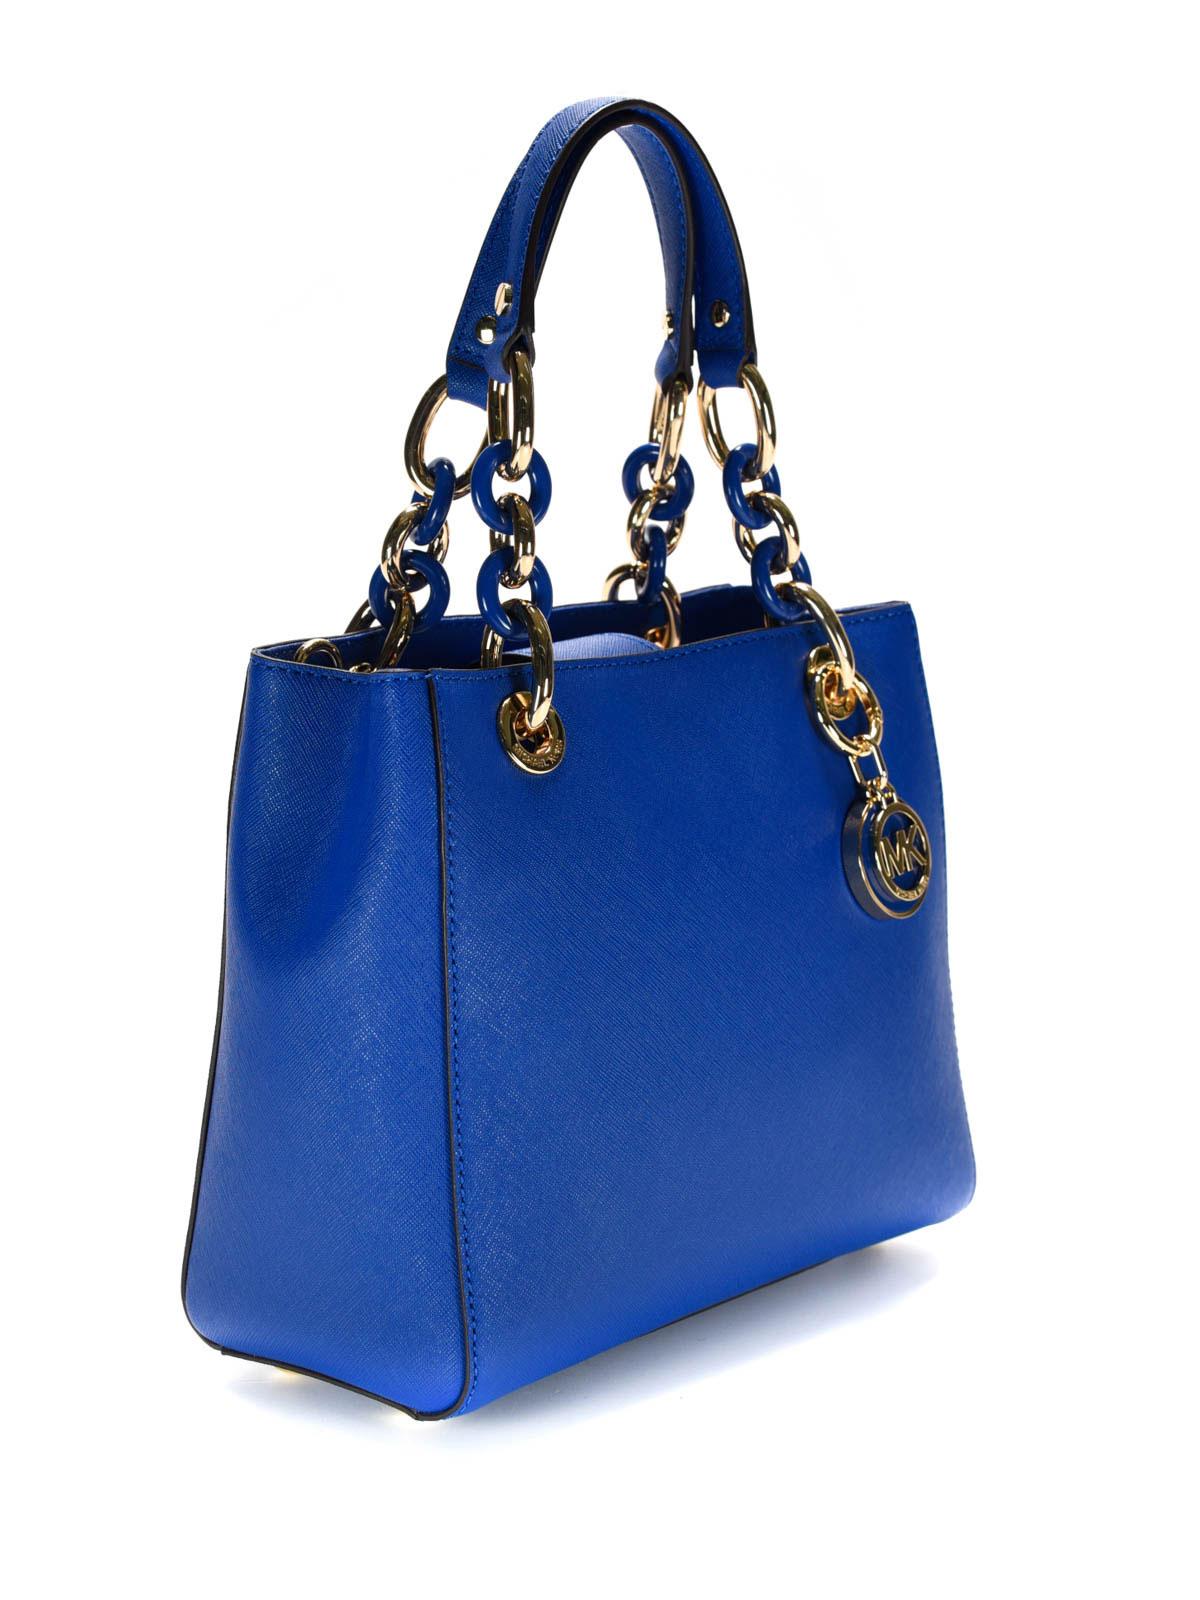 21f2fc4cc584 Michael Kors Small Leather Shoulder Bag | Stanford Center for ...